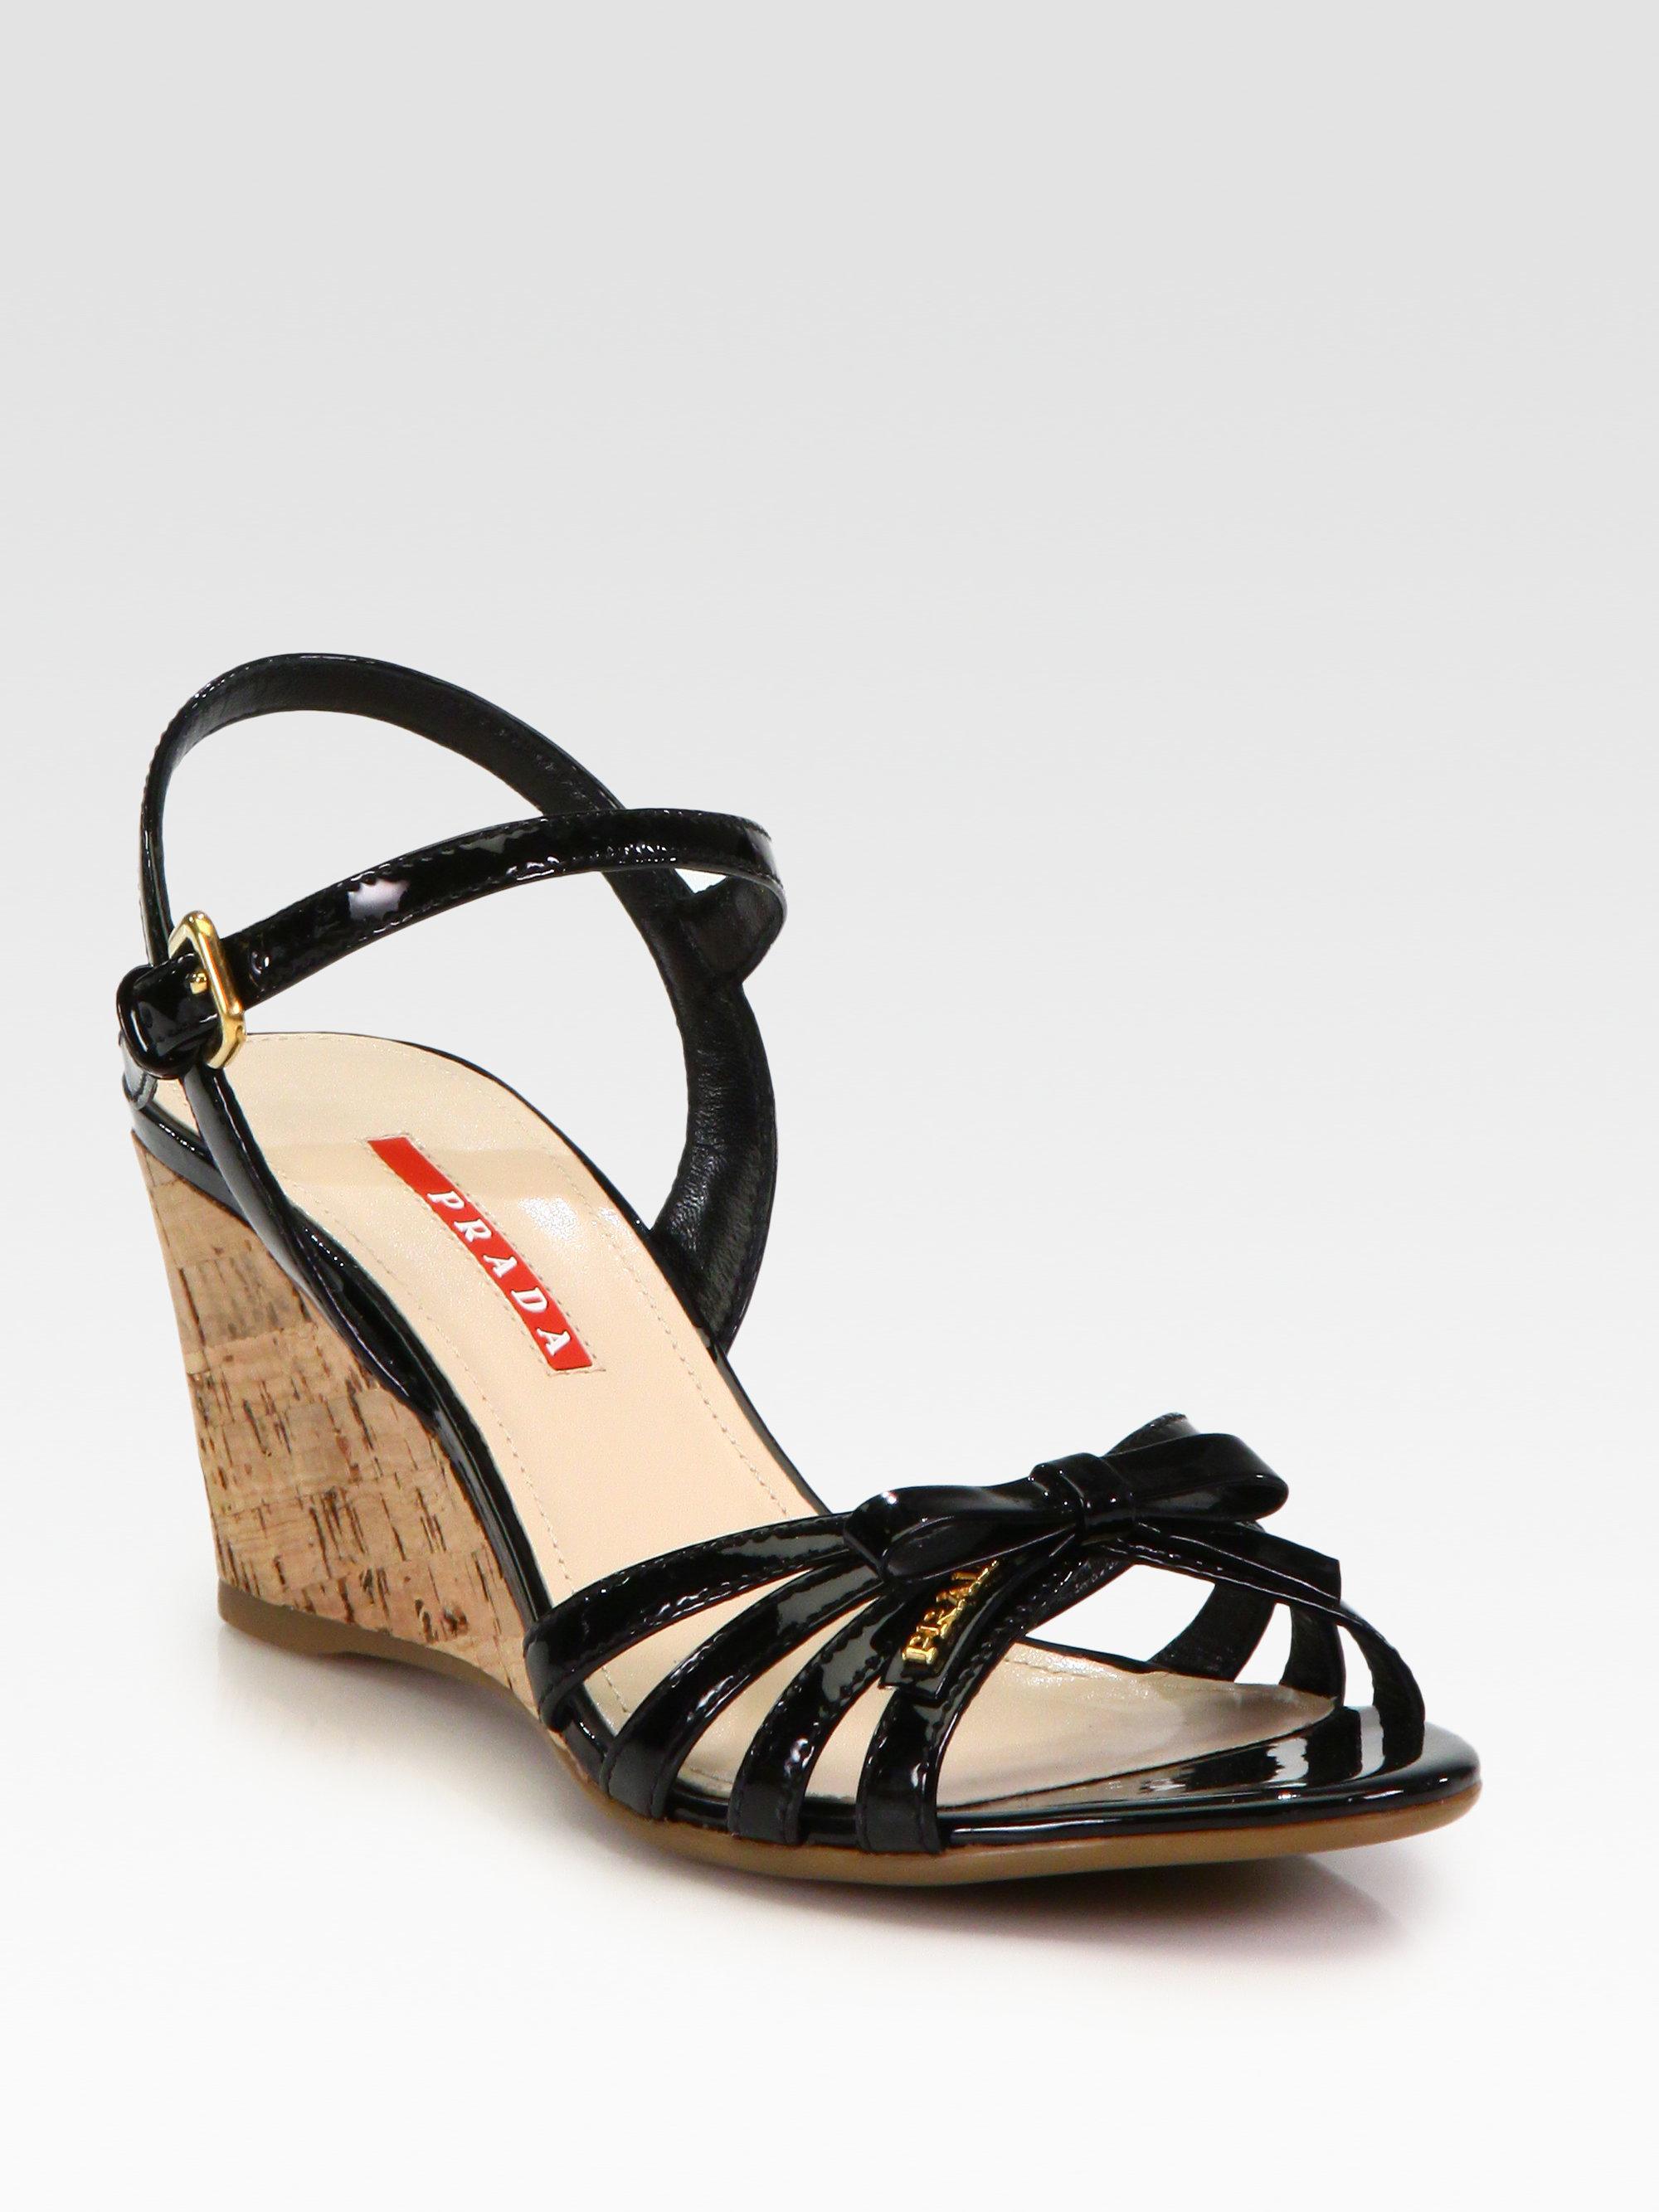 4ad1359b164 Lyst - Prada Leather Bow Cork Wedge Sandals in Black